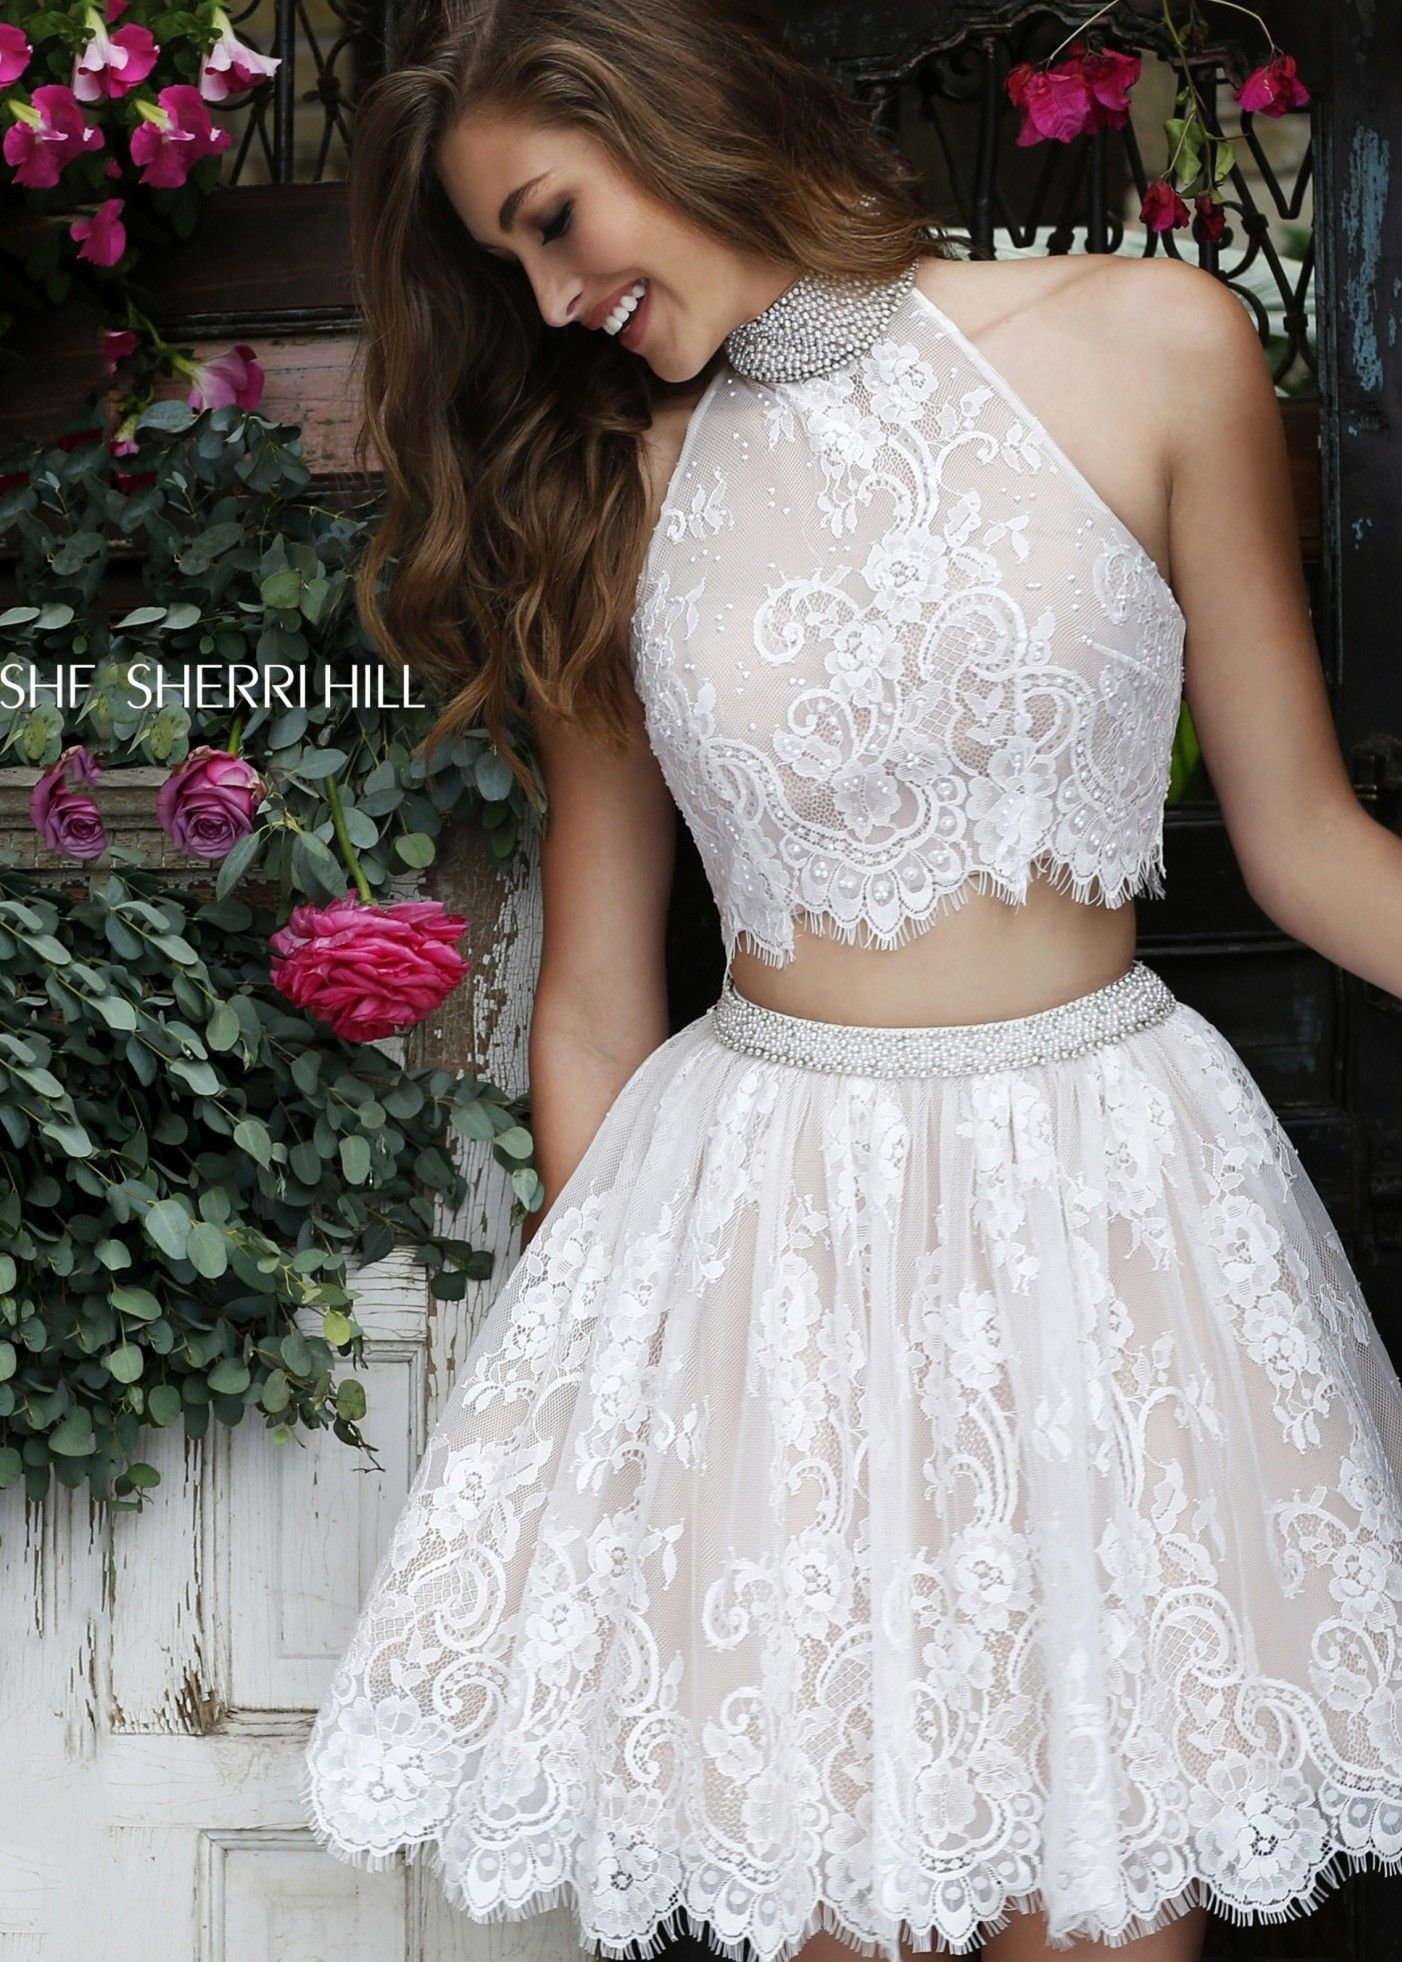 Sherri Hill 32290 Ivory Lace Two Piece Prom Dress Piece Prom Dress Prom Dresses Two Piece Simple Prom Dress [ 1962 x 1402 Pixel ]